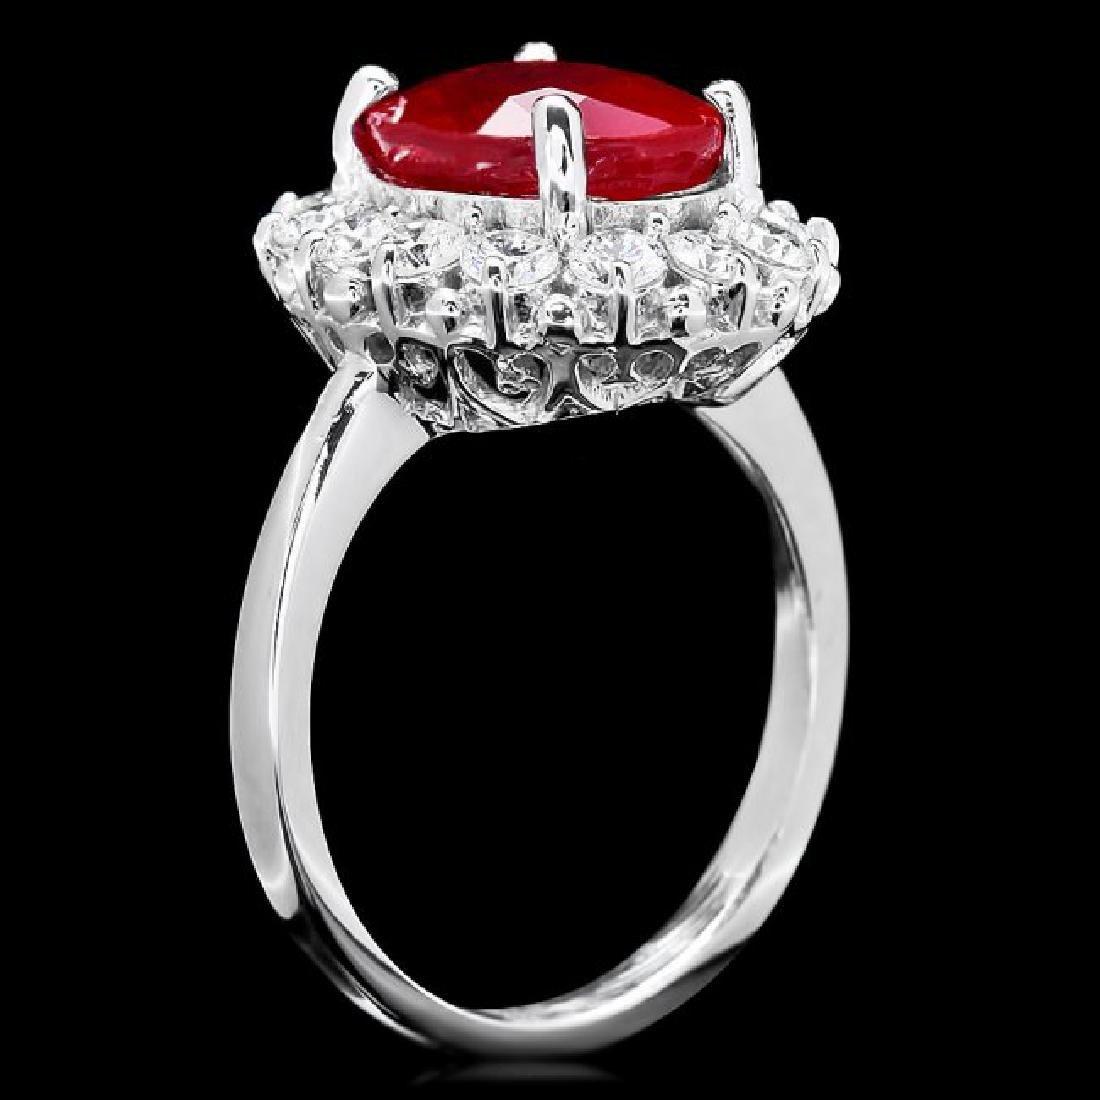 14k White Gold 5.00ct Ruby 1.00ct Diamond Ring - 3